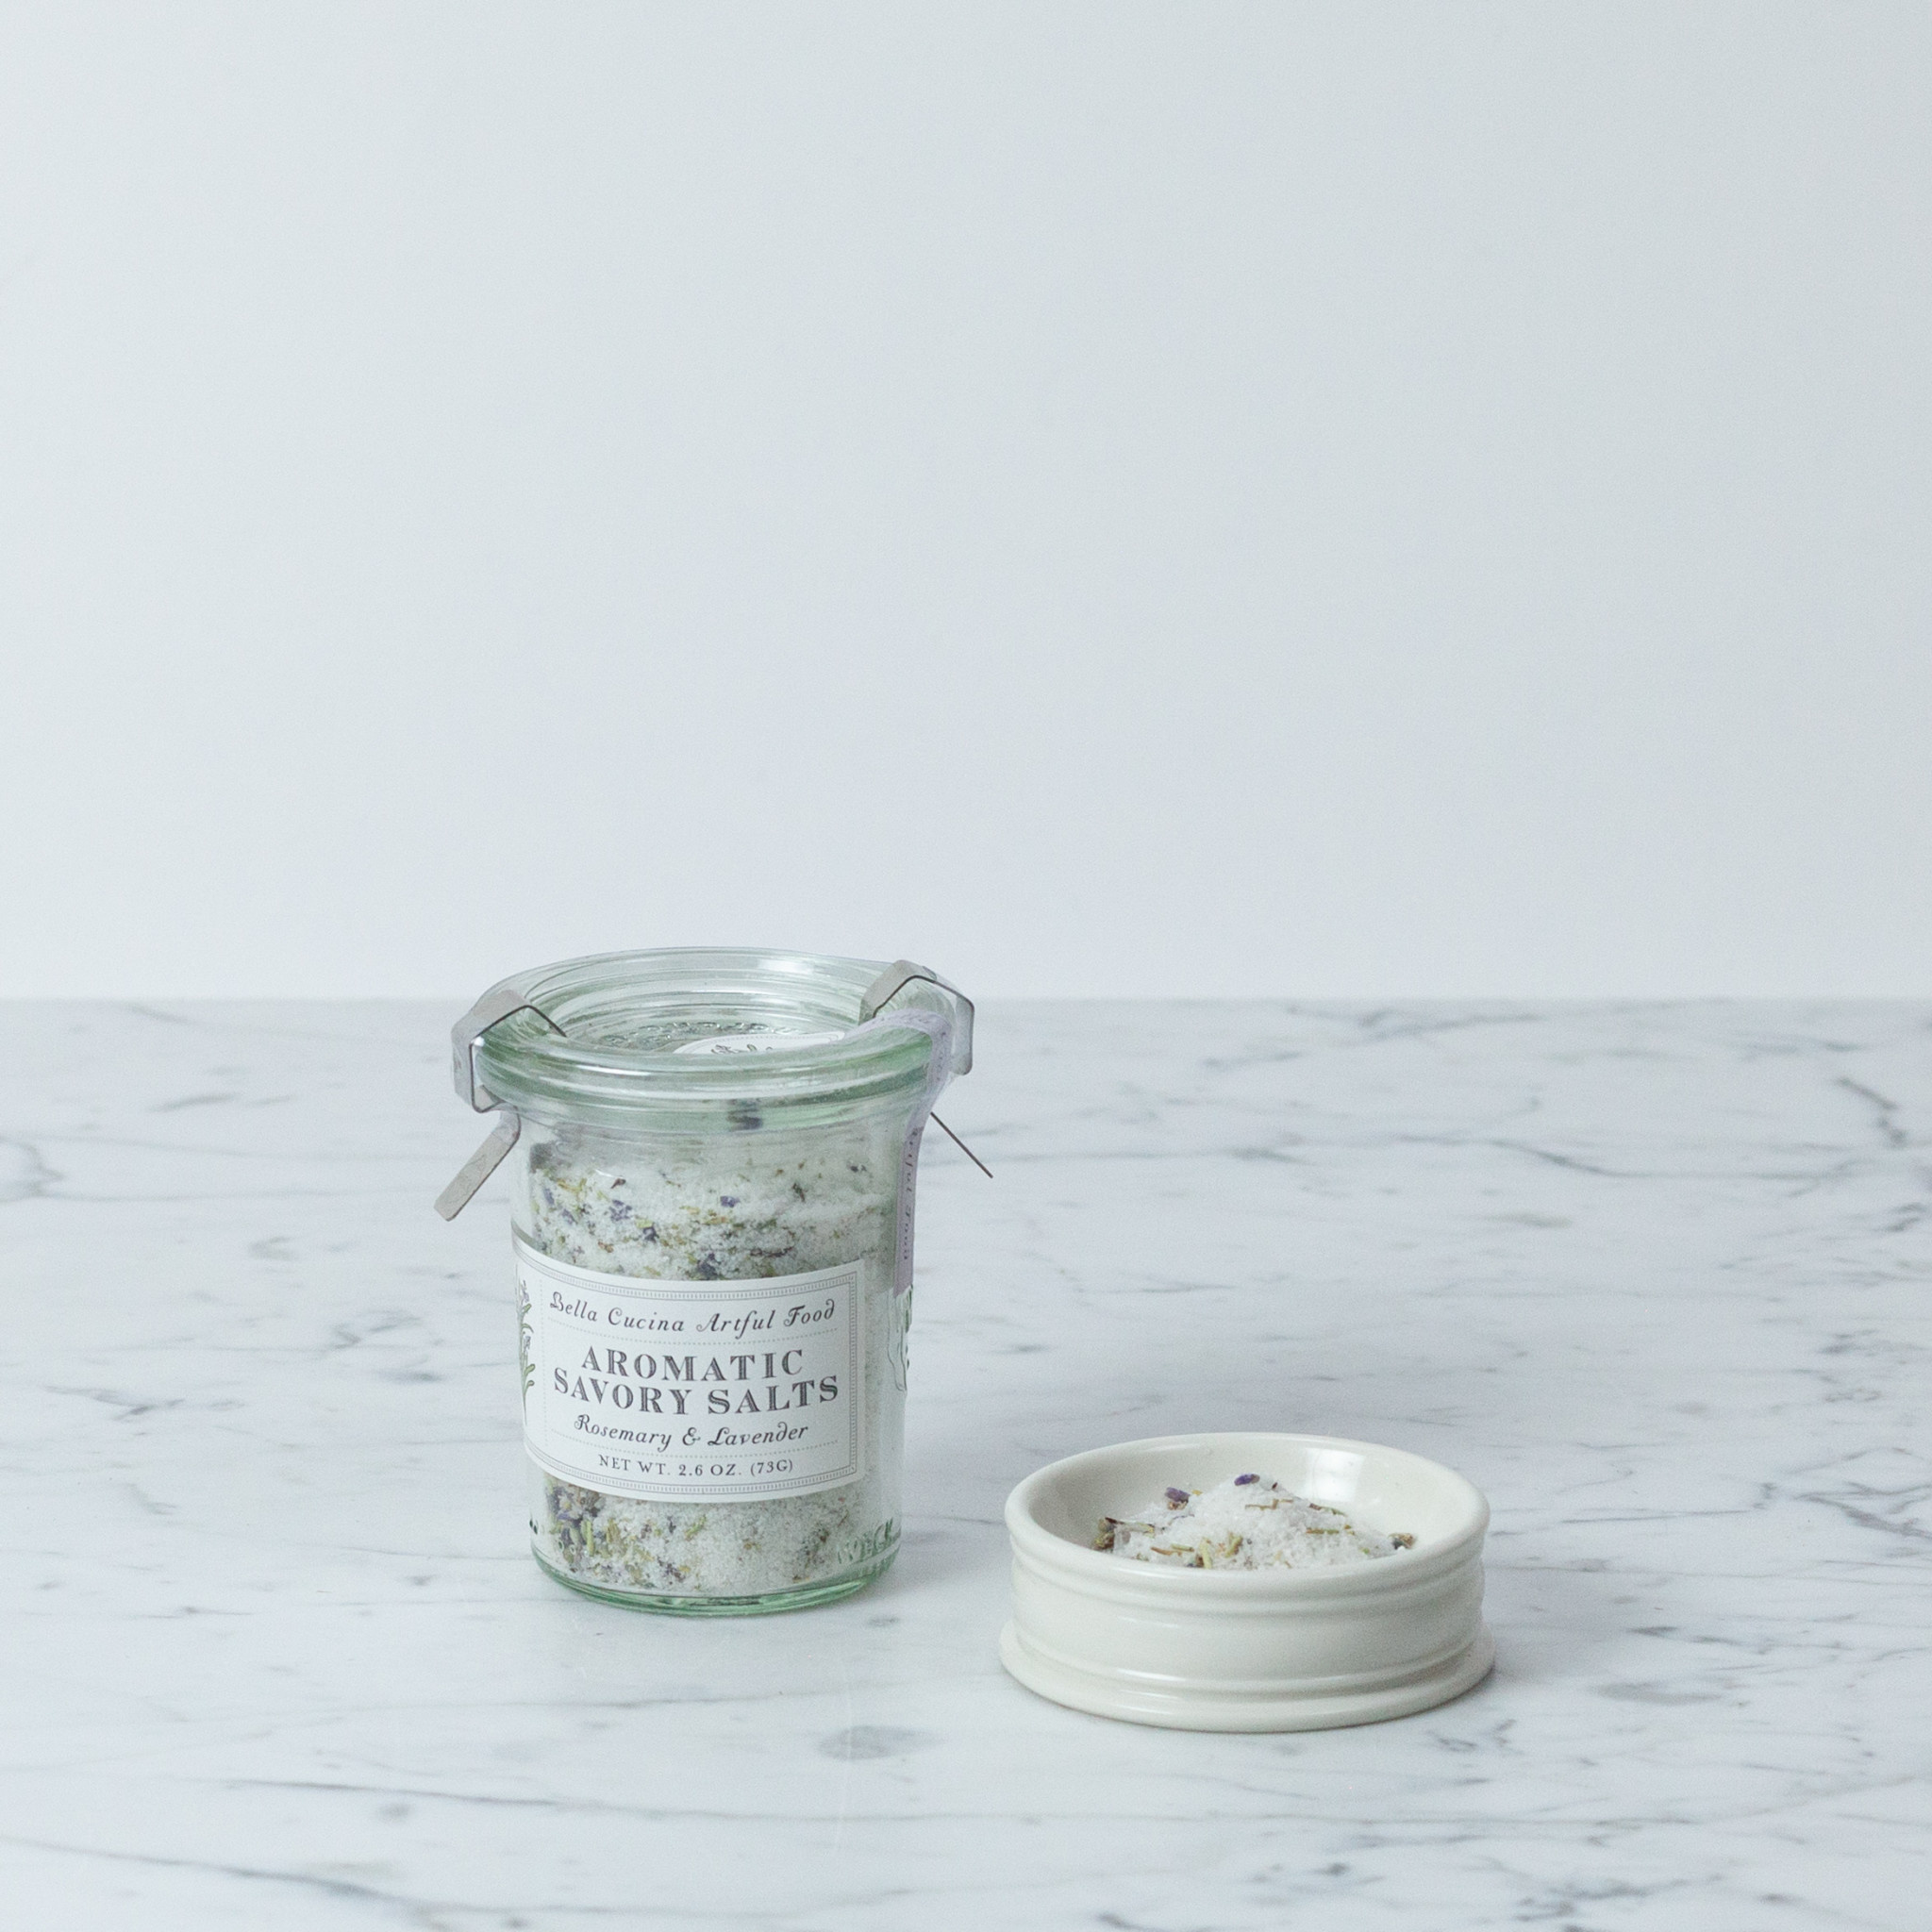 Bella Cucina Rosemary + Lavender Savory Salt in WECK Jar - 2.6oz